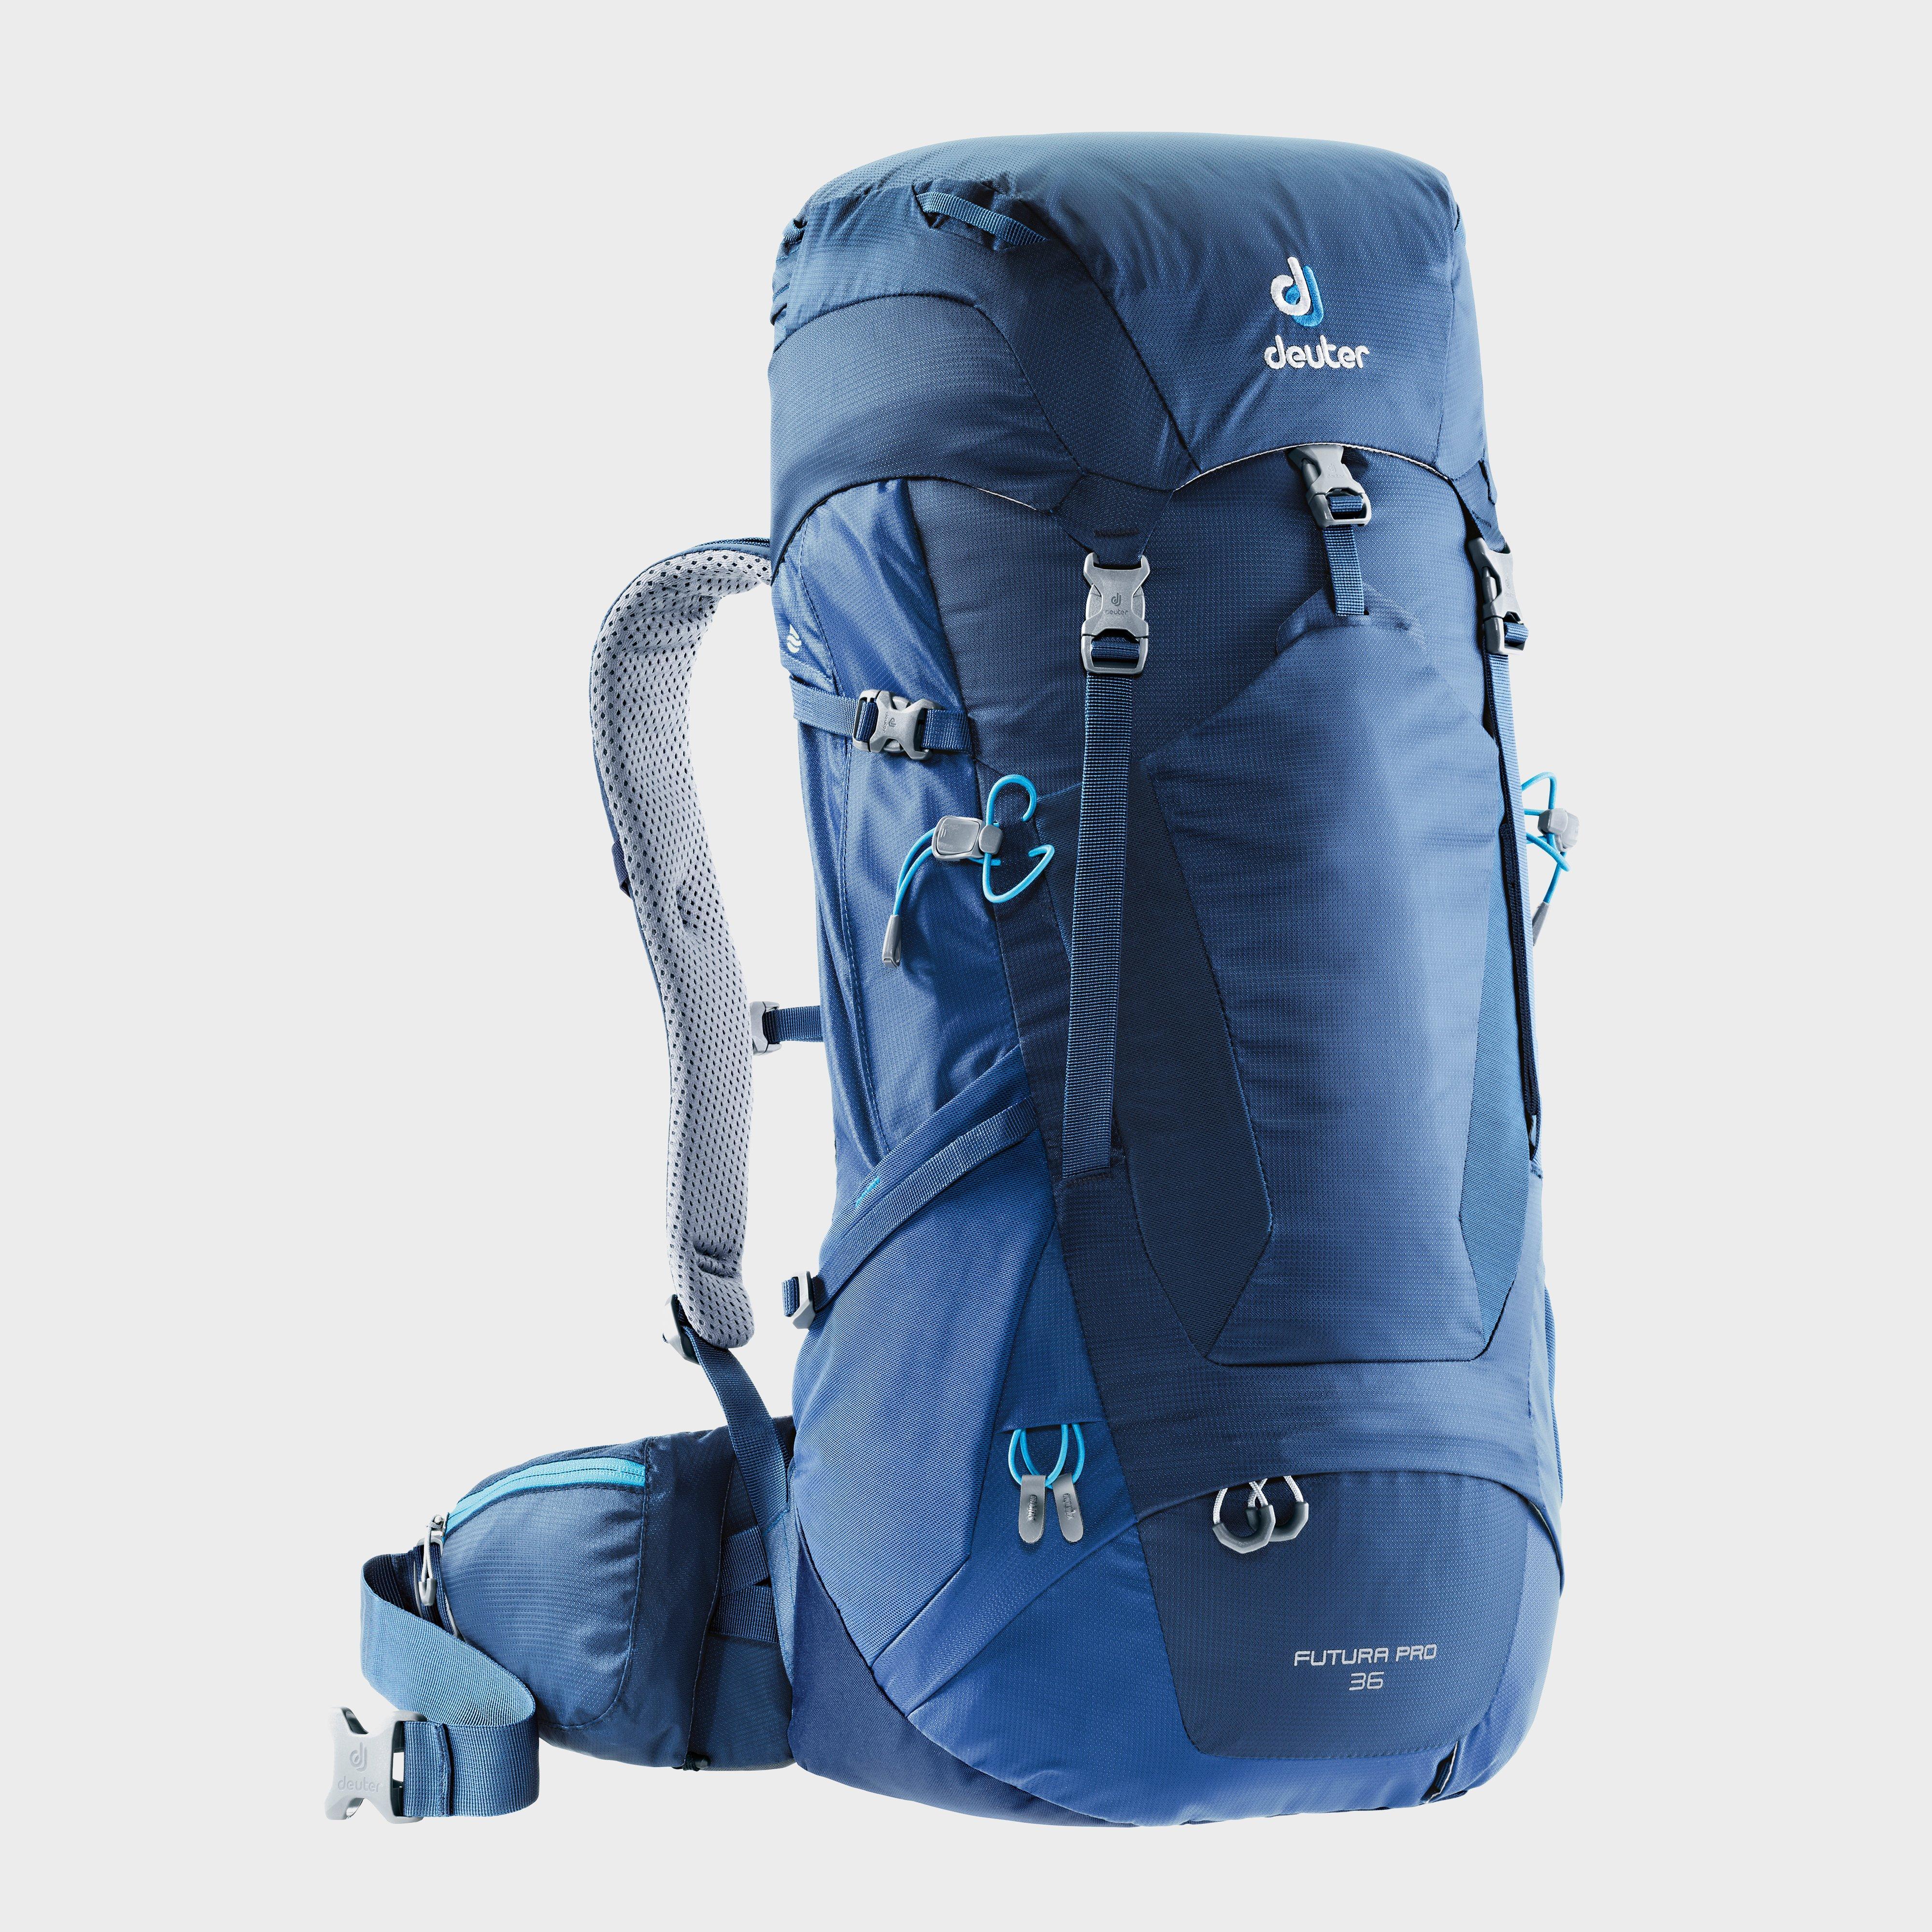 Deuter Futura Pro 36 Hiking Pack, Black